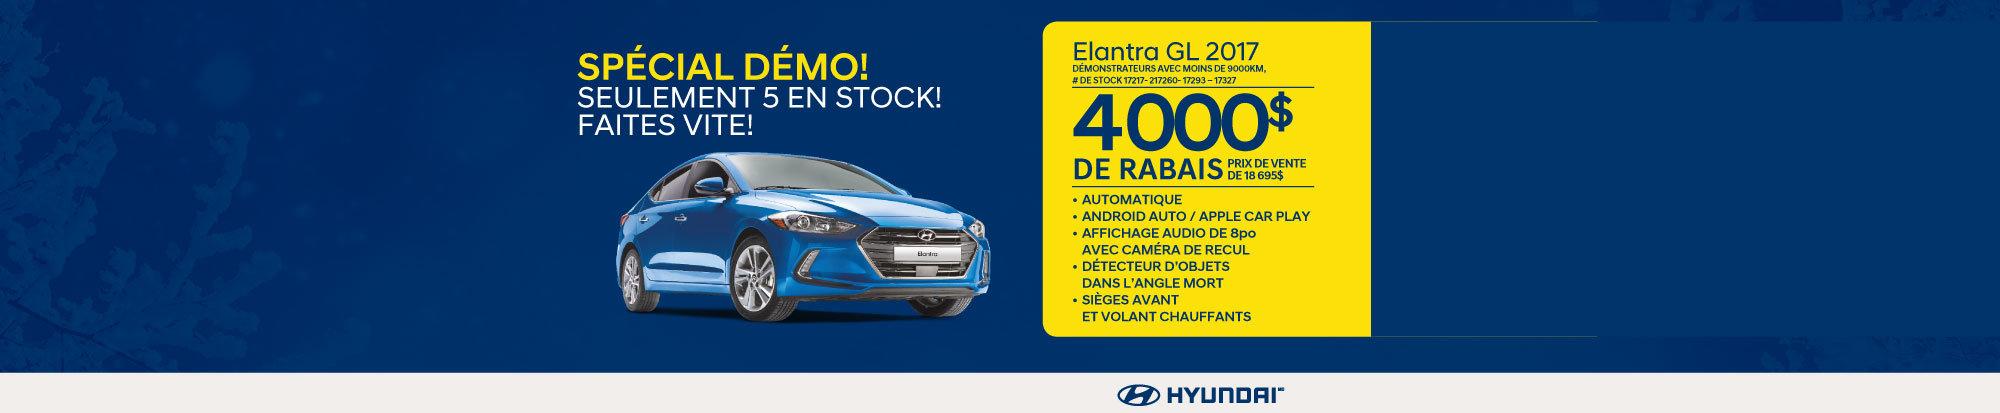 Hyundai Elantra 2017 web